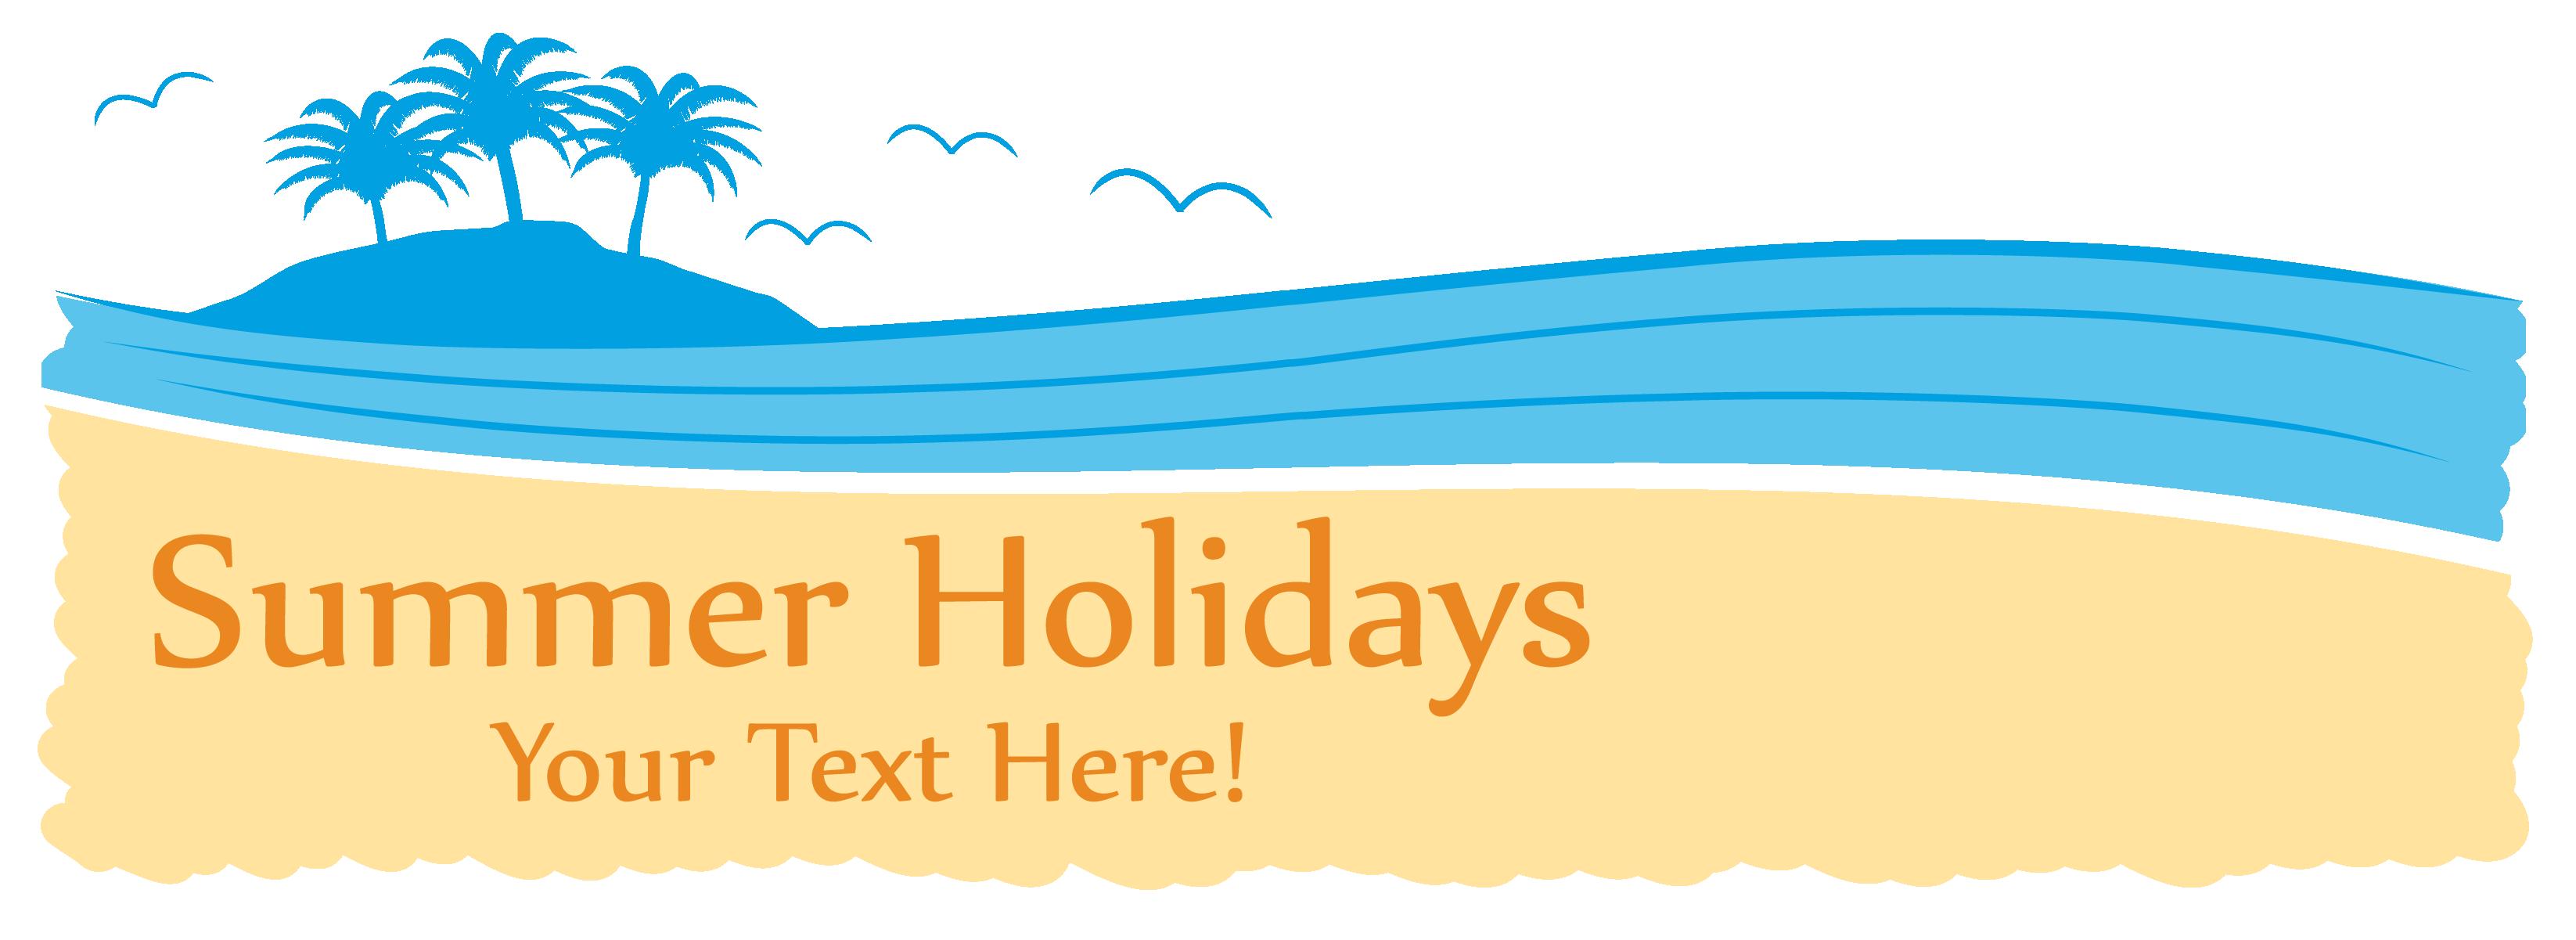 Web beach coconut tree. Clipart wave banner